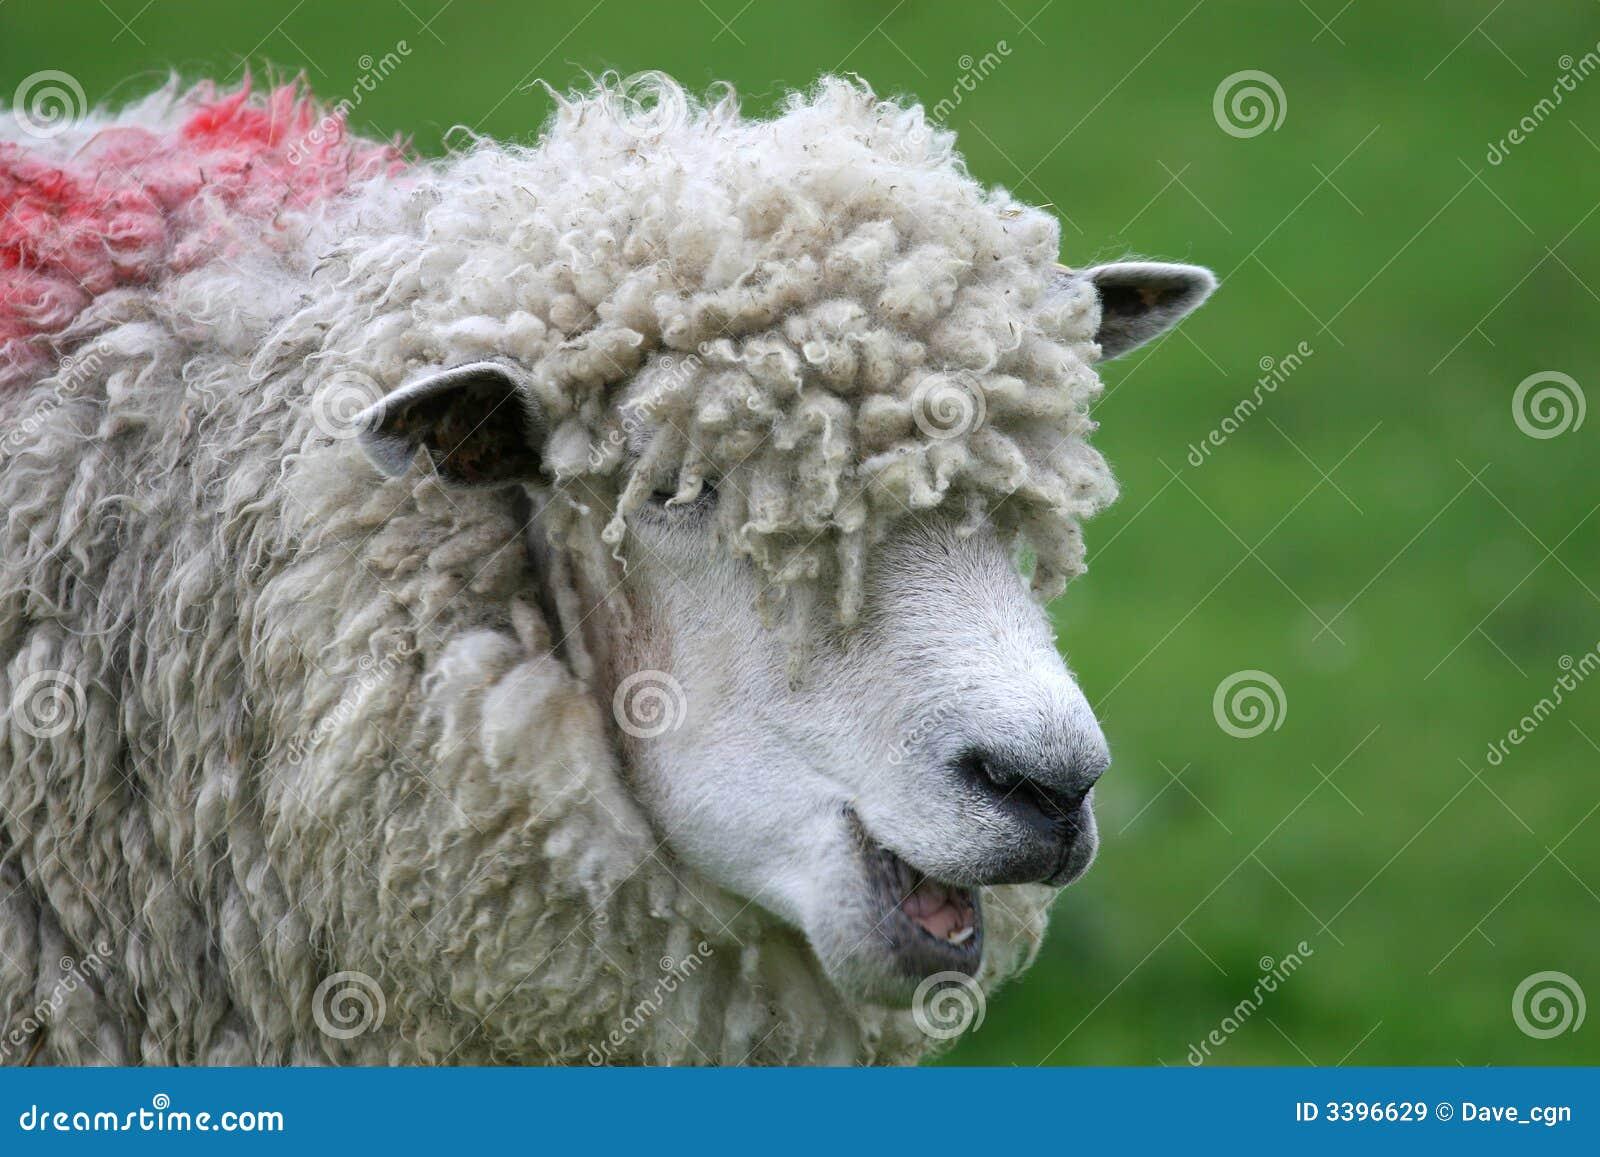 Funny Black Sheep Meme : Funny dog memes